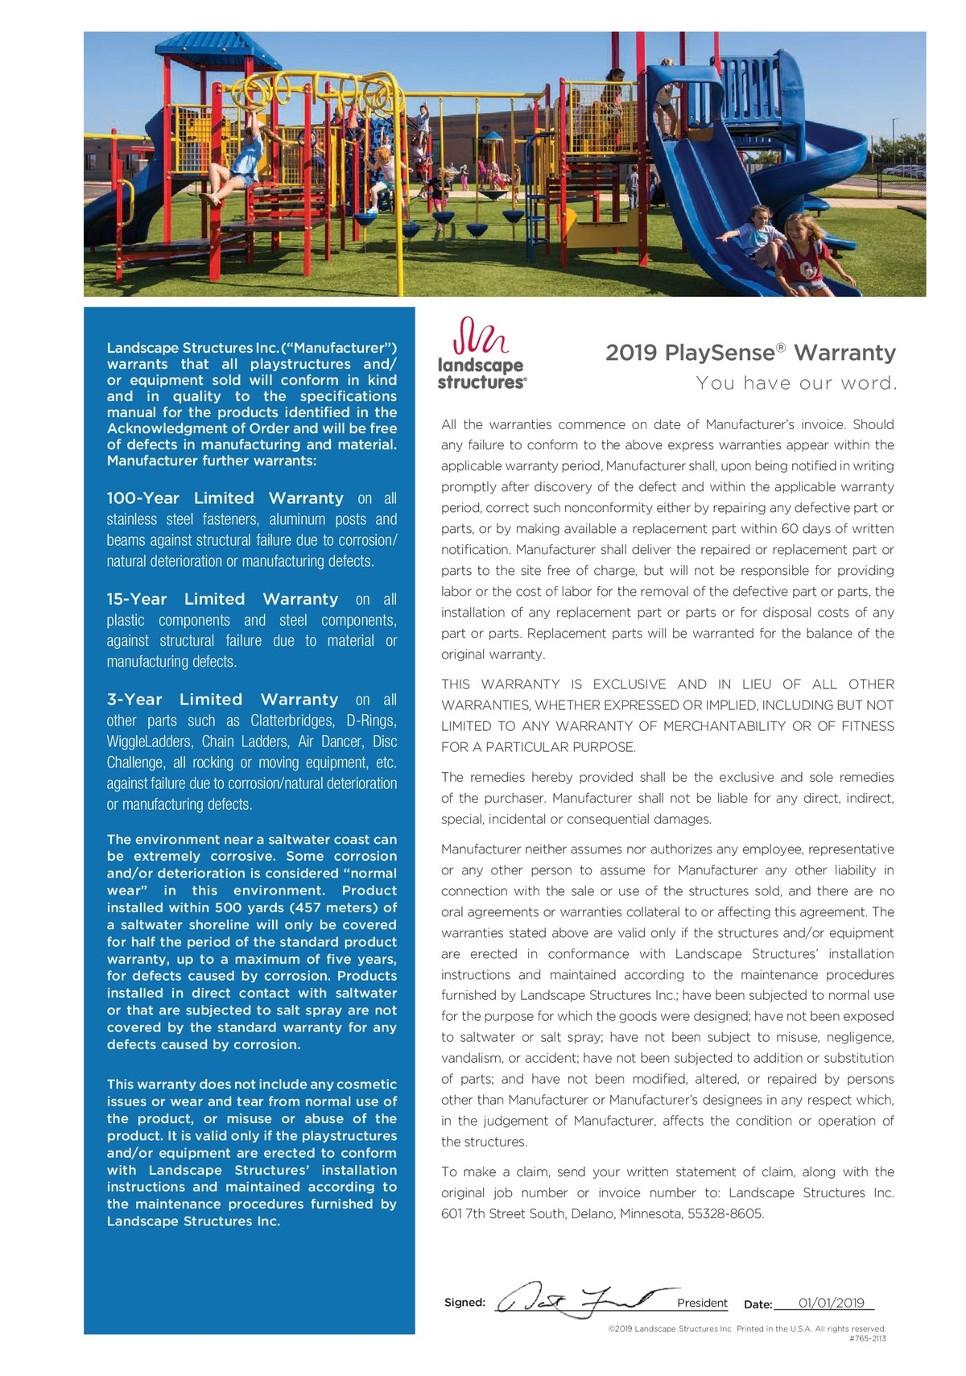 2019 PlaySense® Warranty - Landscape Structures